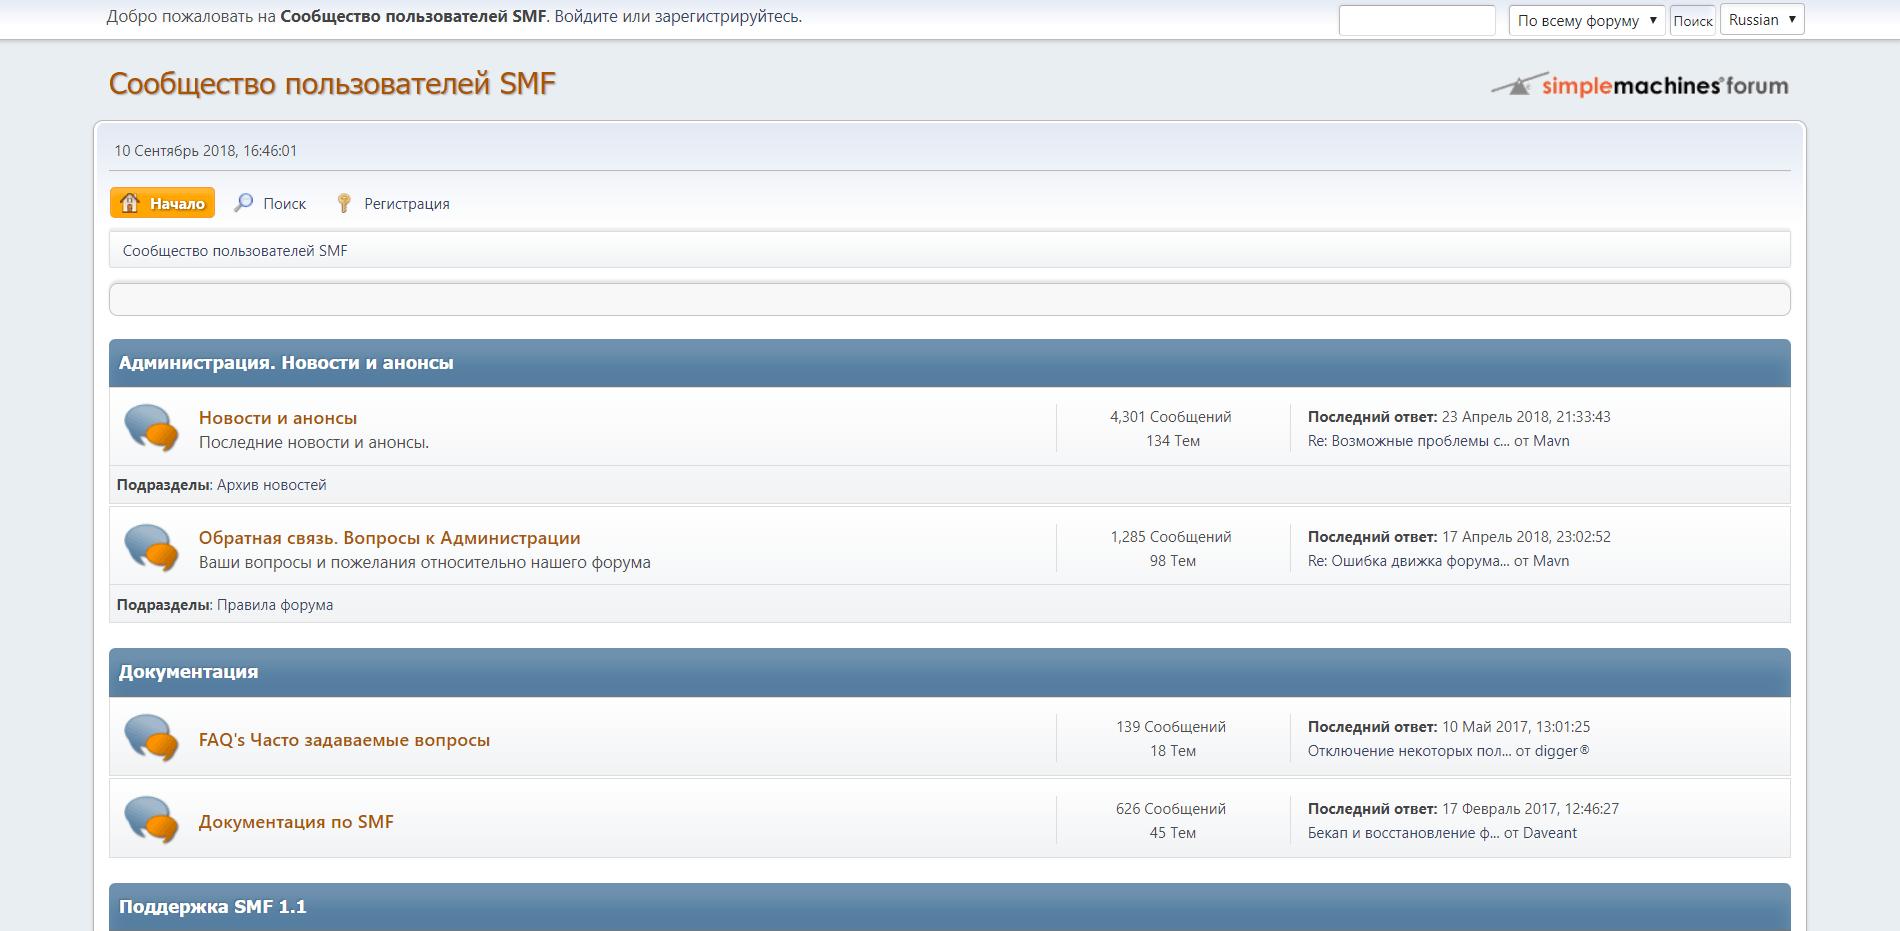 Simple Machines Forum - опенсорсная платформа для форумов